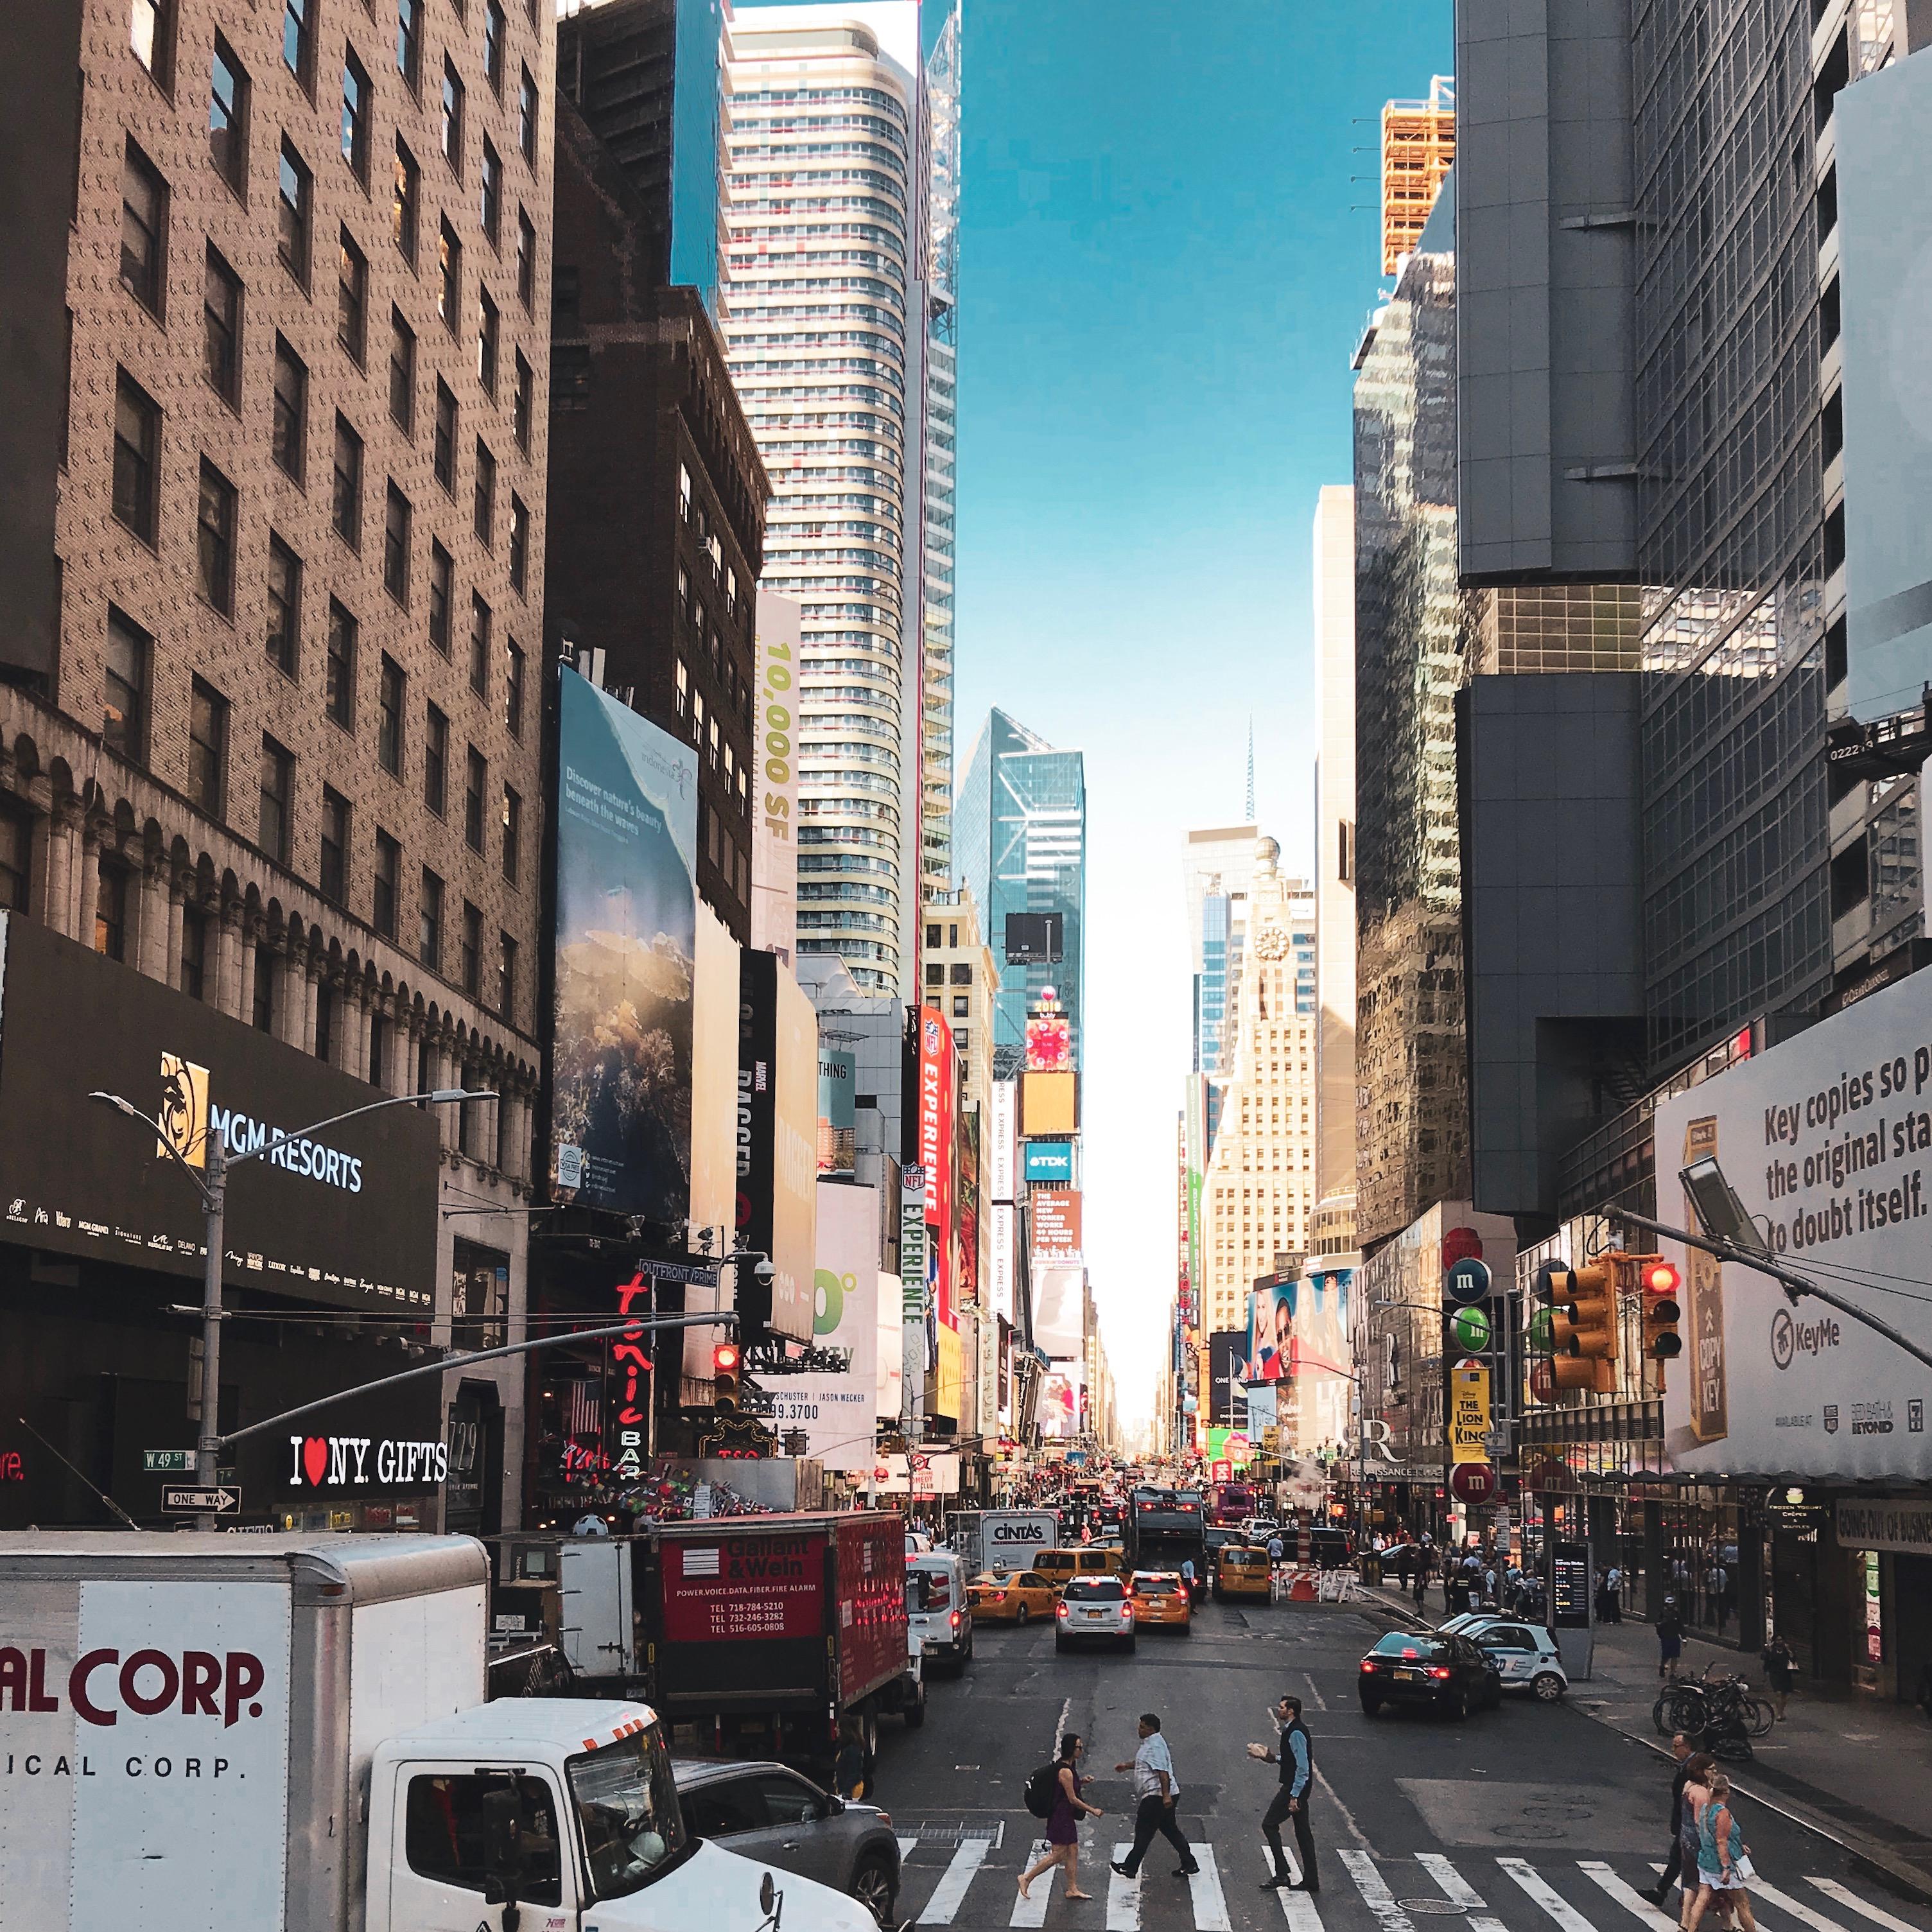 viaggio-a-new-york-manhattan-times-square-broadway